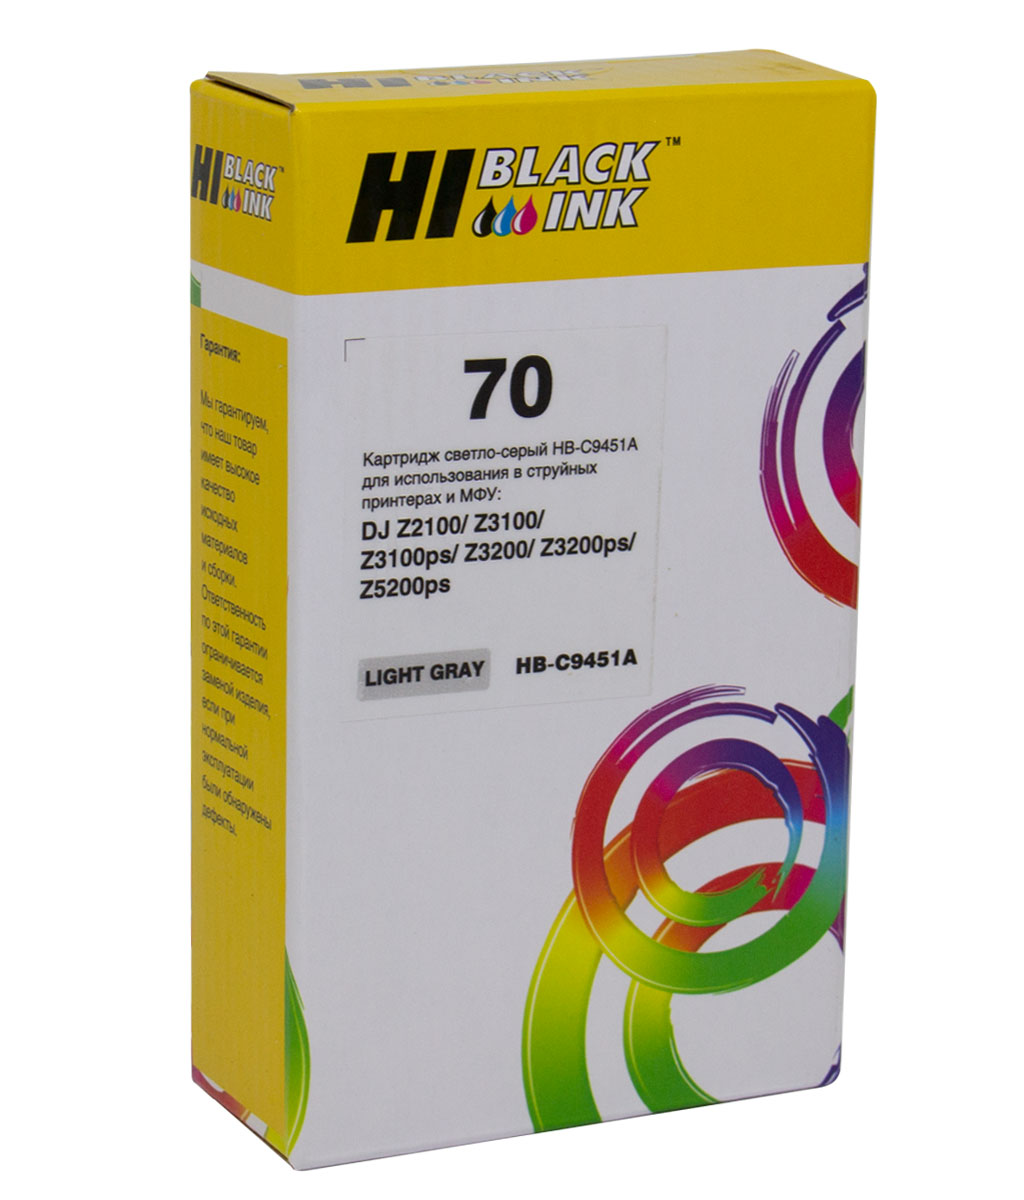 Картридж Hi-Black (HB-C9451A) №70 для HP DesignJet z2100/3100/3200/5200, LGY